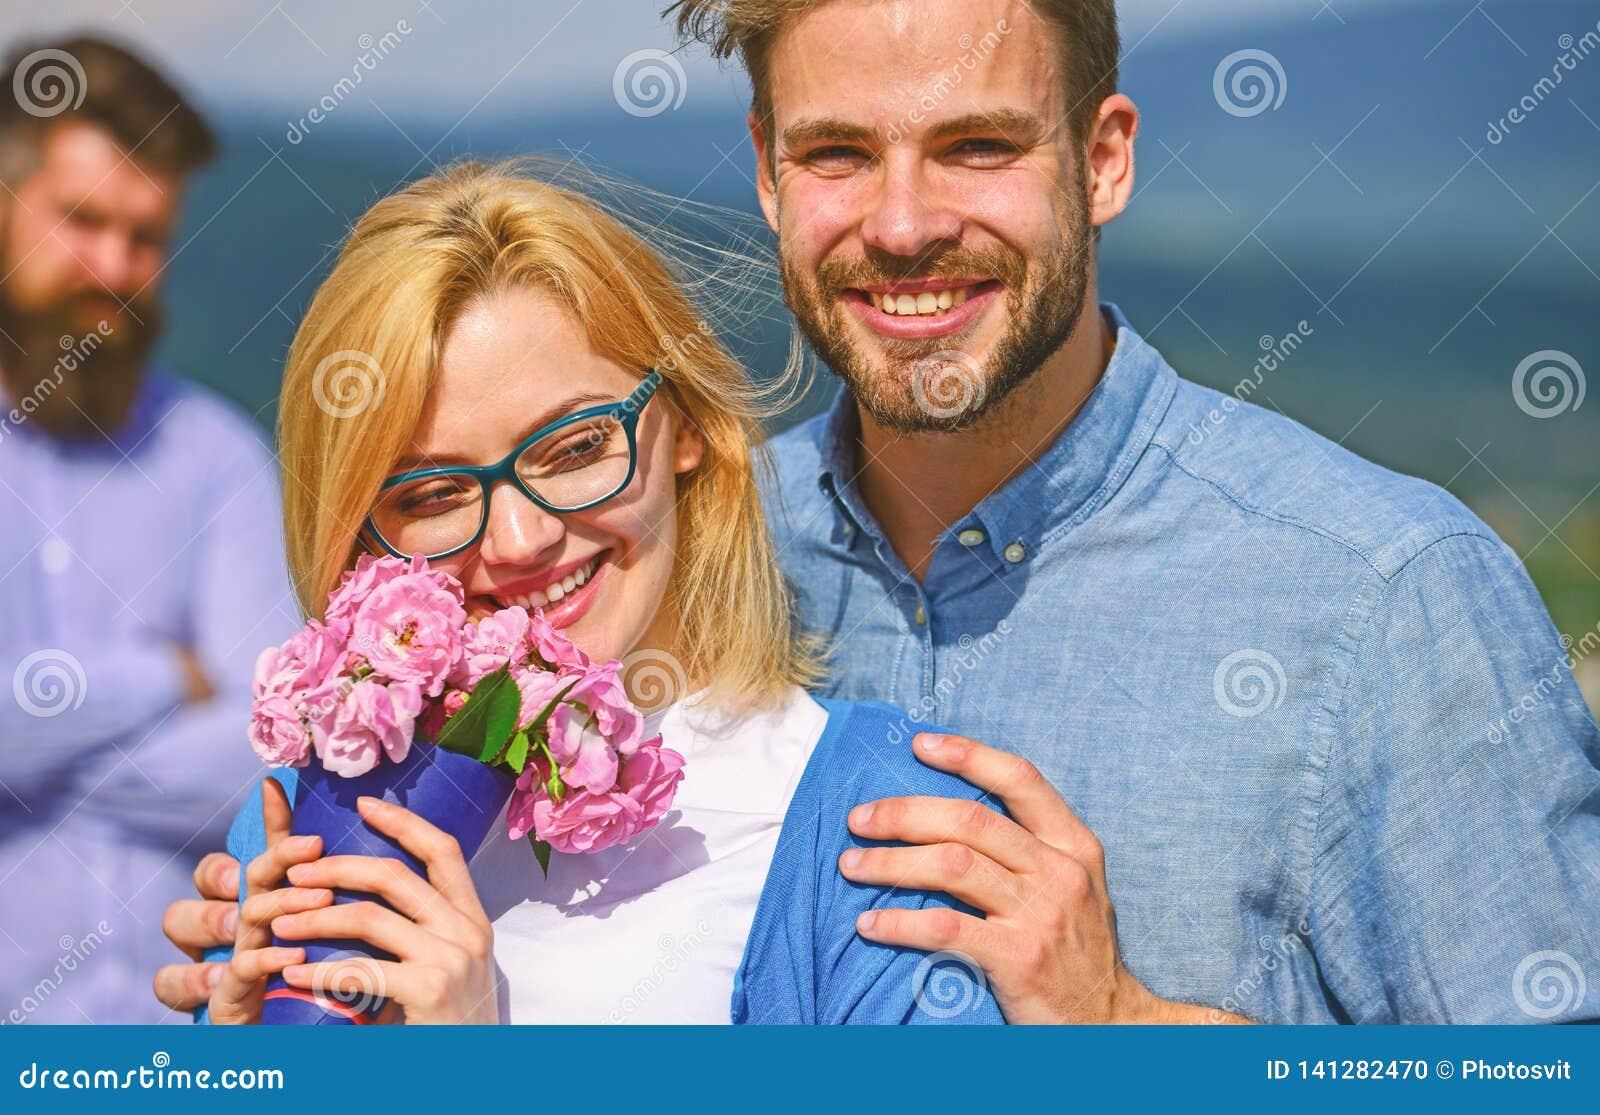 Amerikaanse soldaten dating sites